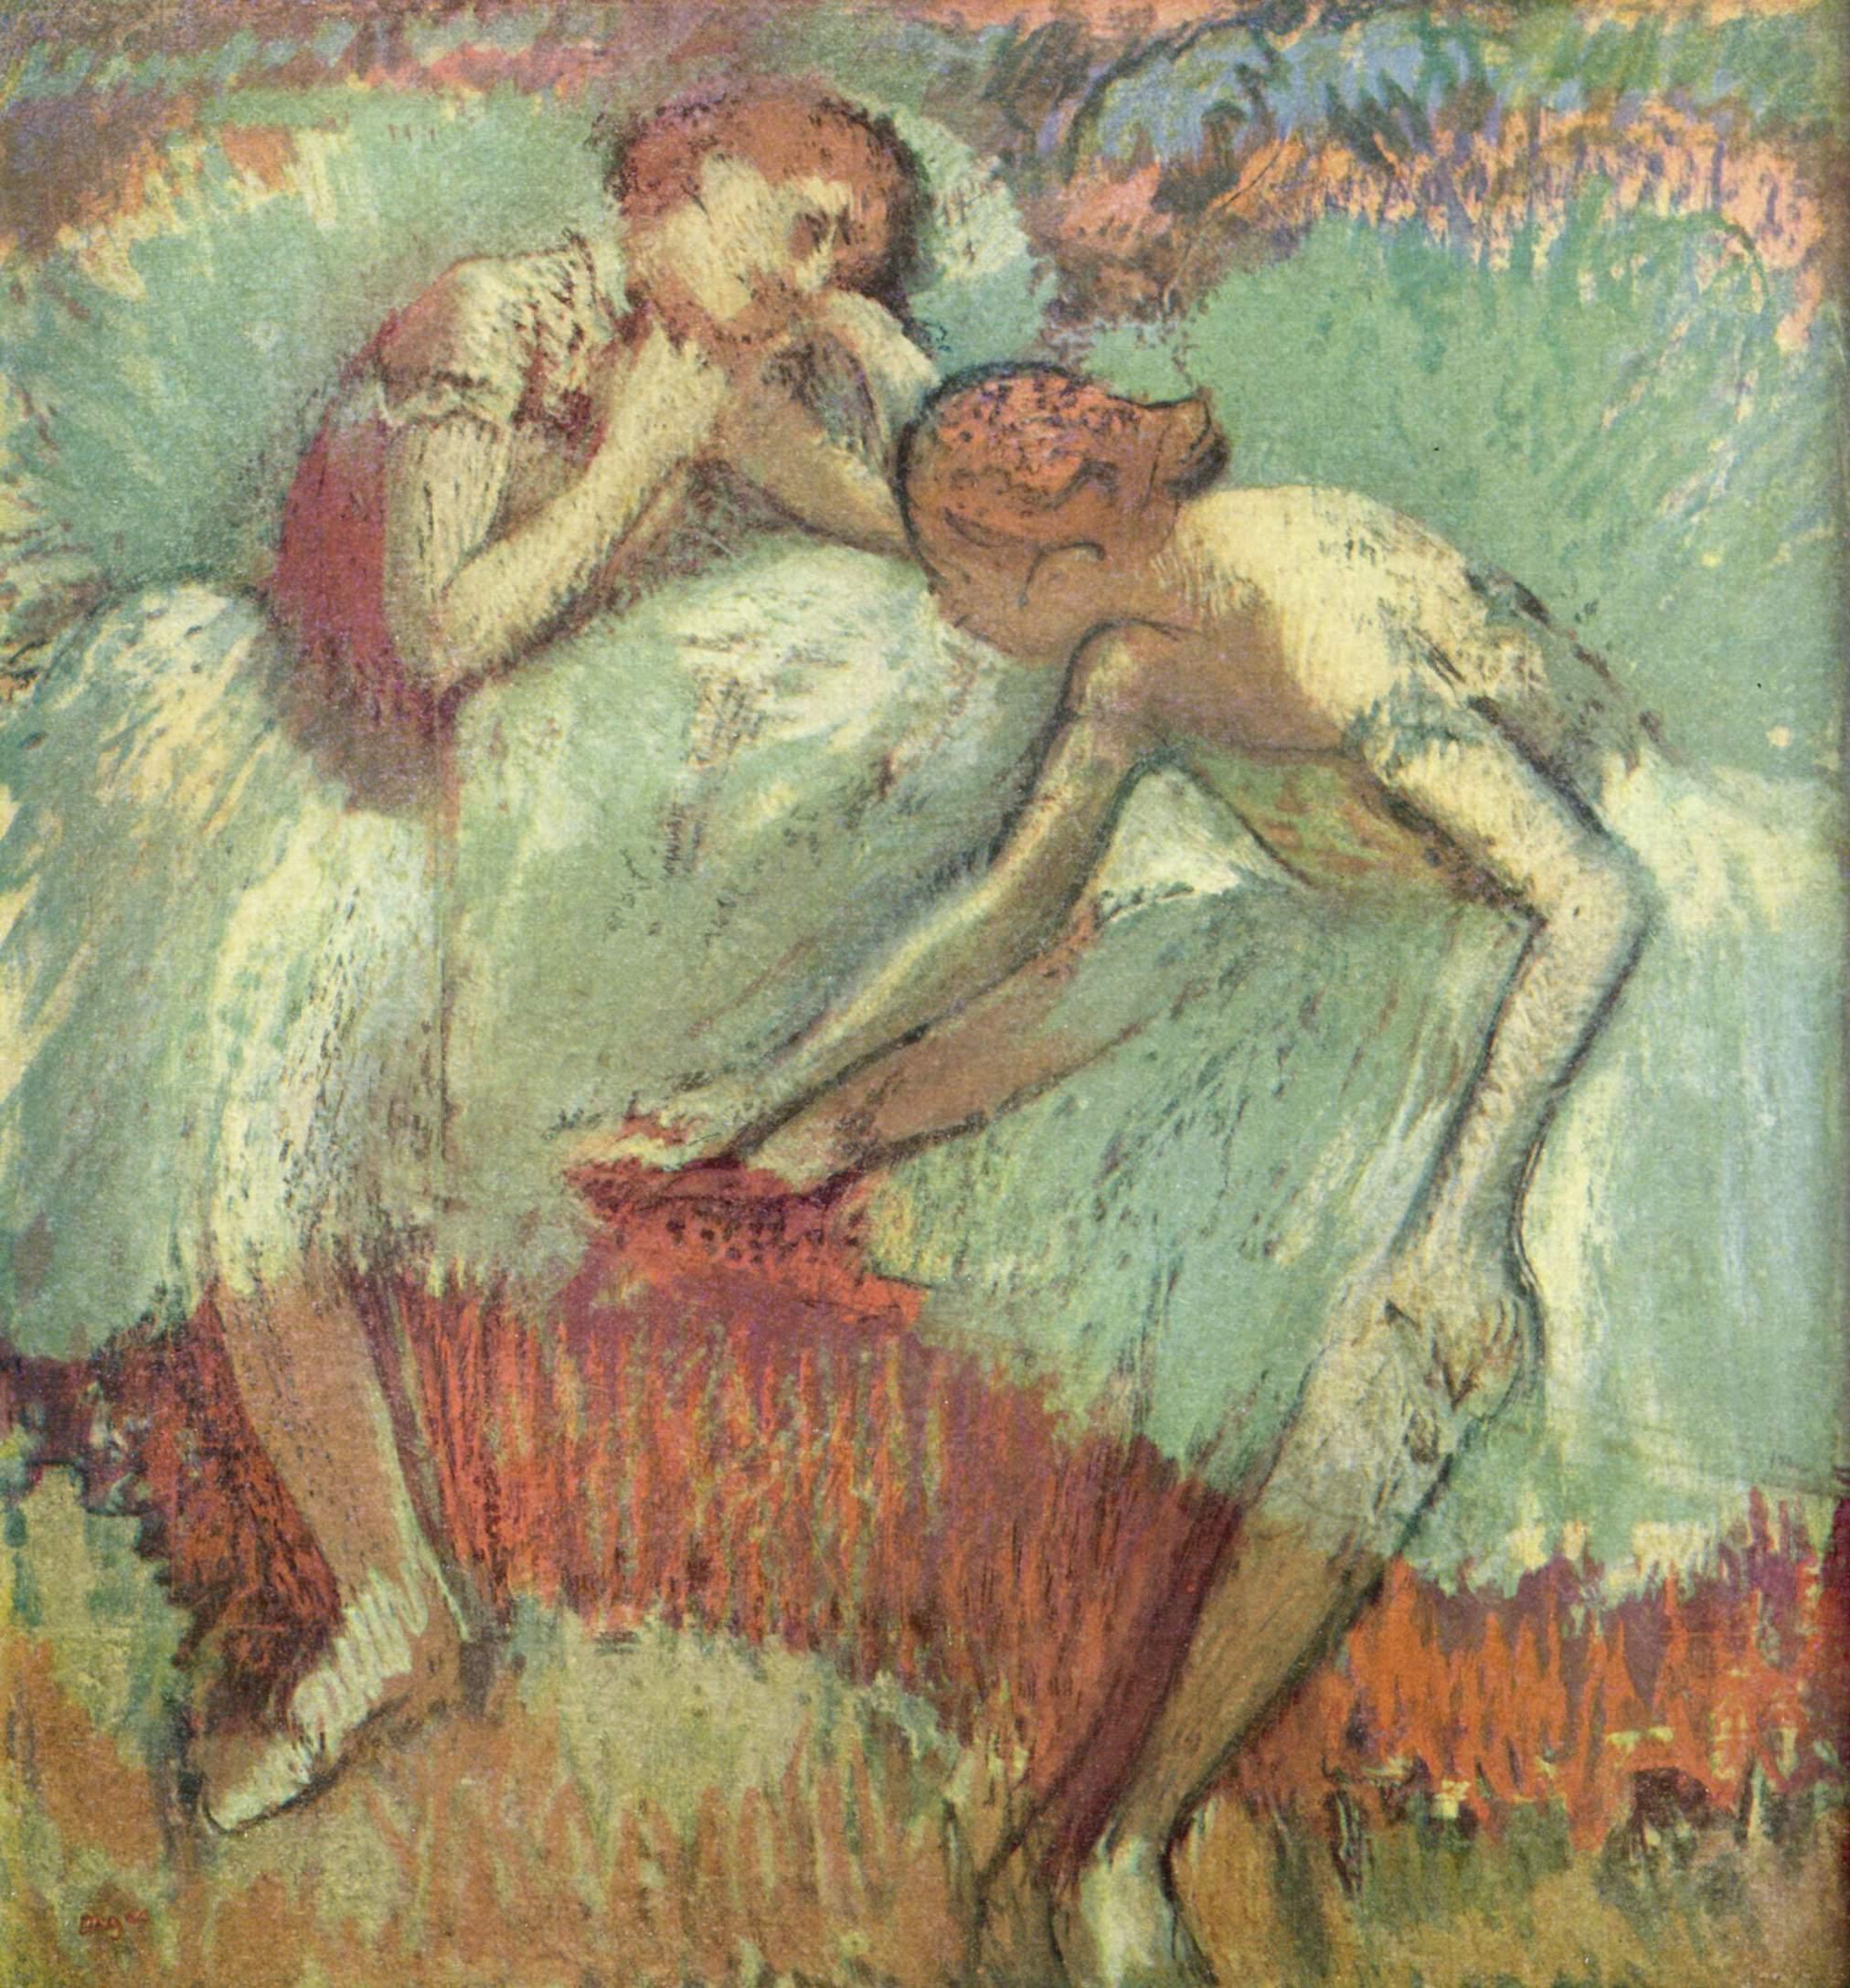 Танцовщица в зелёном, Эдгар-Жермен - Илер Дега